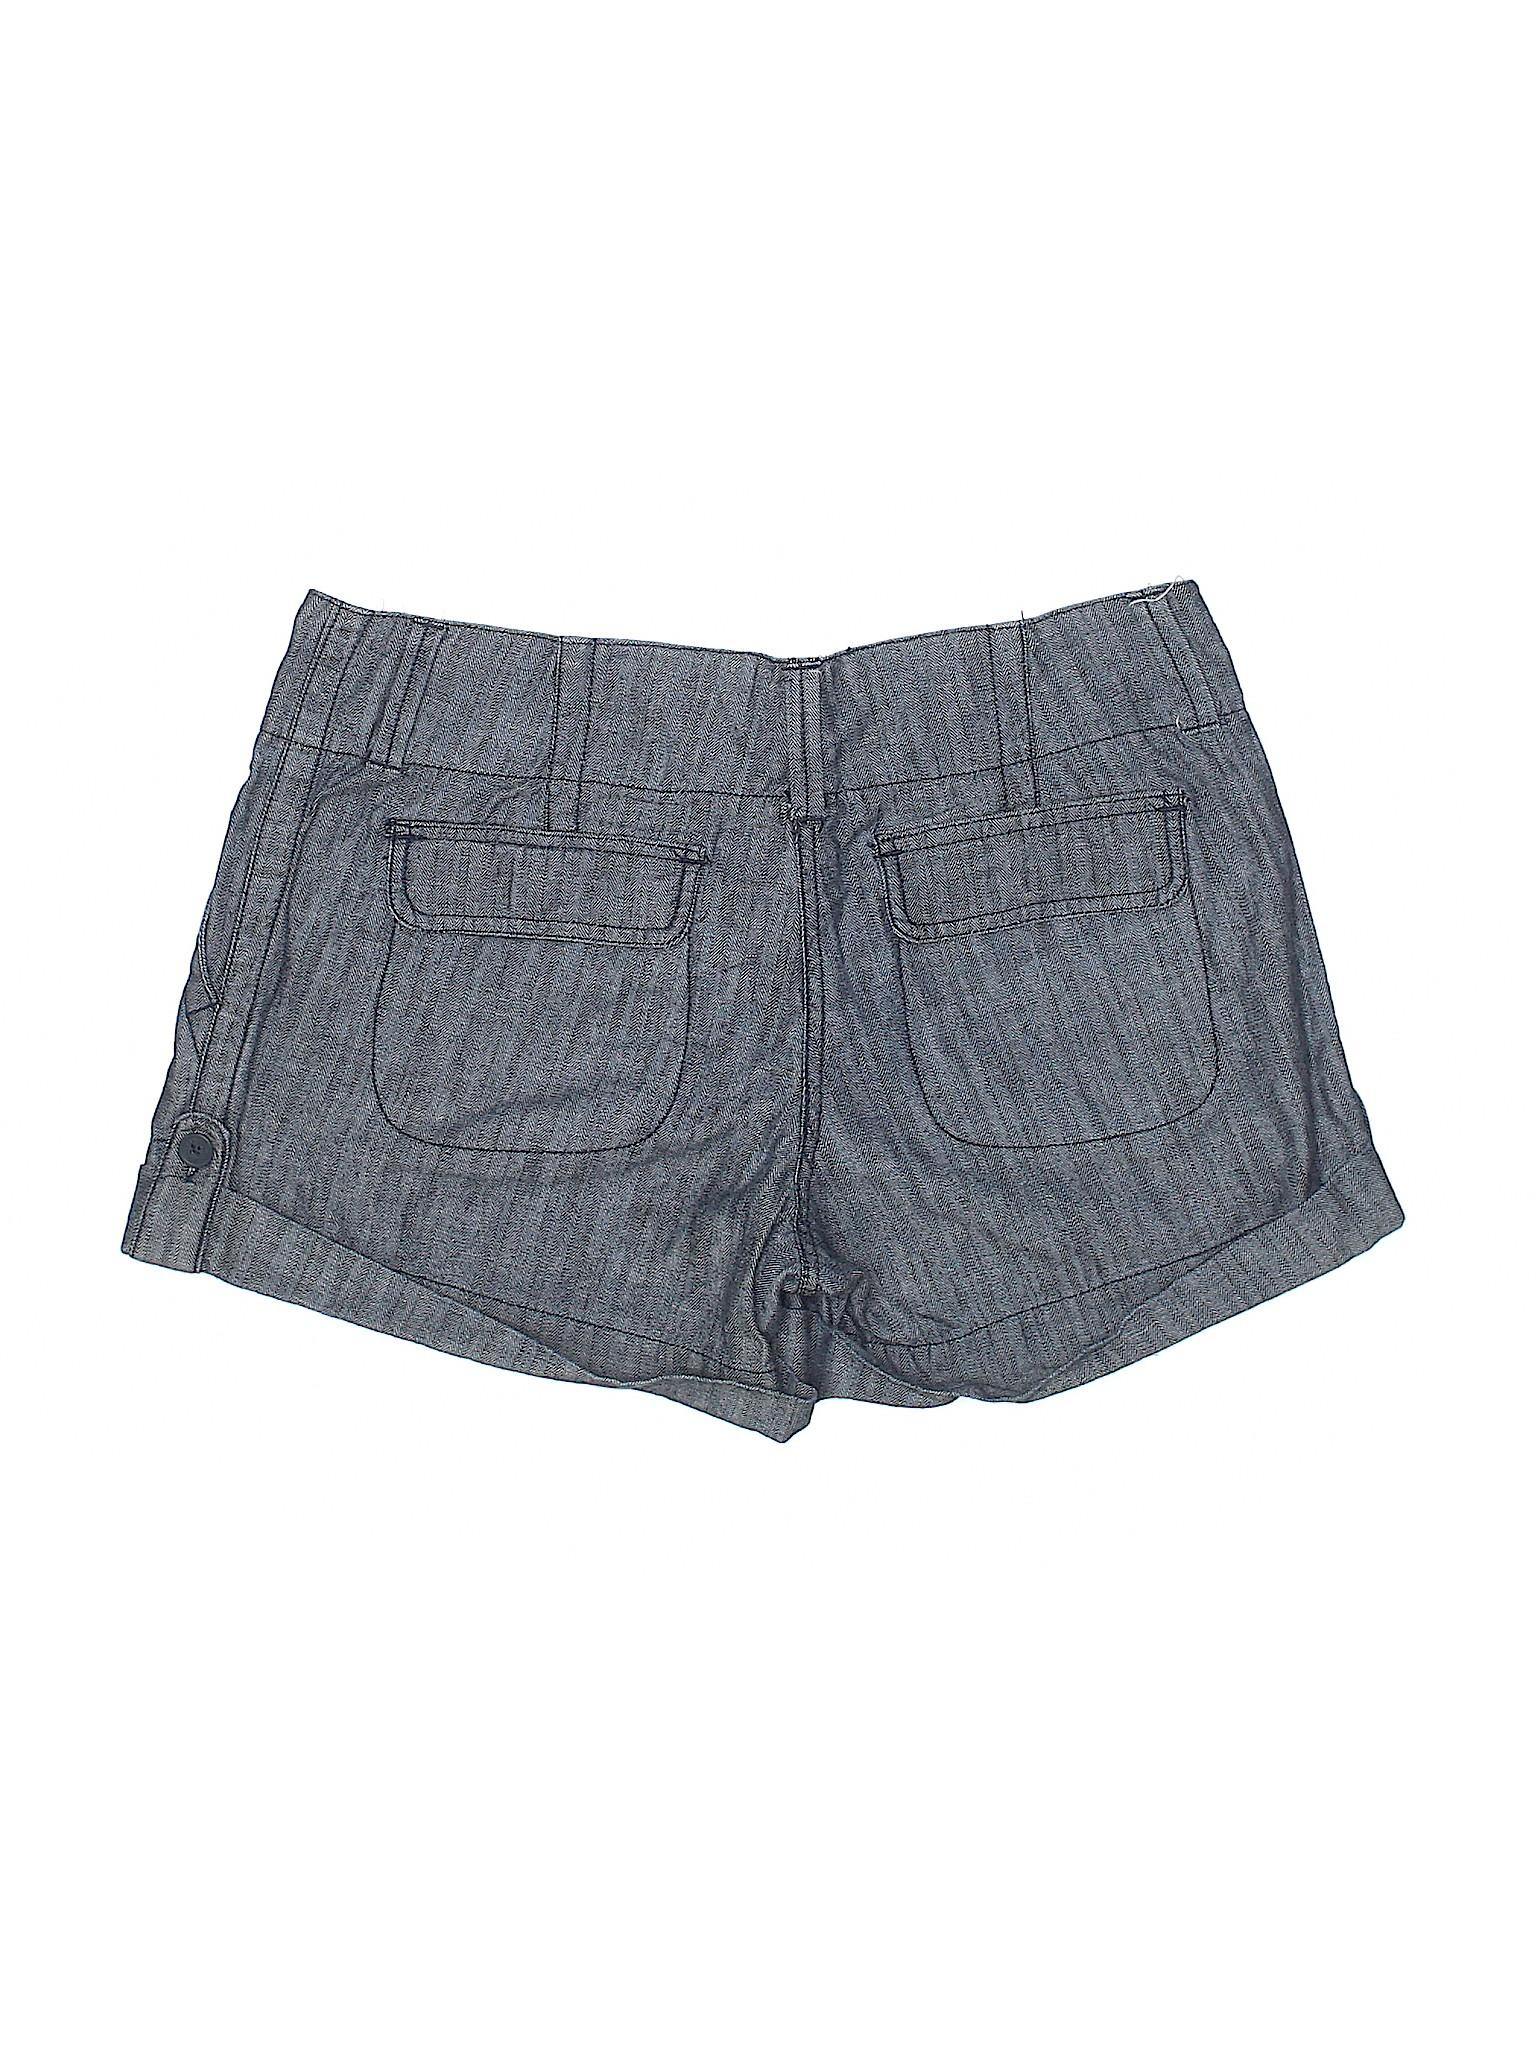 York New Shorts Company amp; Boutique y1zwgqTP